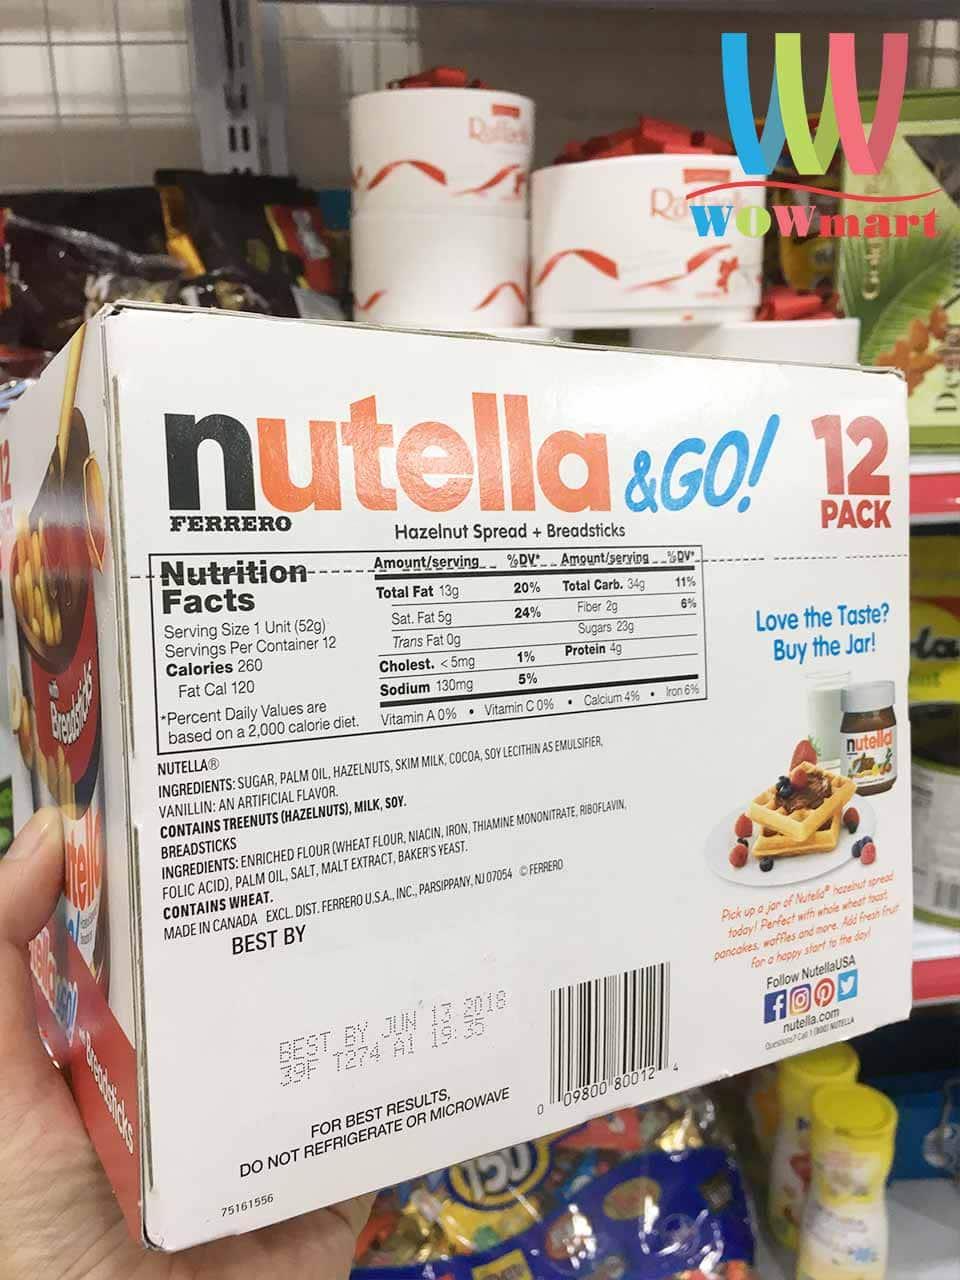 Bánh que chấm chocolate Nutella & Go Hazelnut Spread with Breadsticks 624g  (Loại 12 gói) - Wowmart VN | 100% hàng ngoại nhập